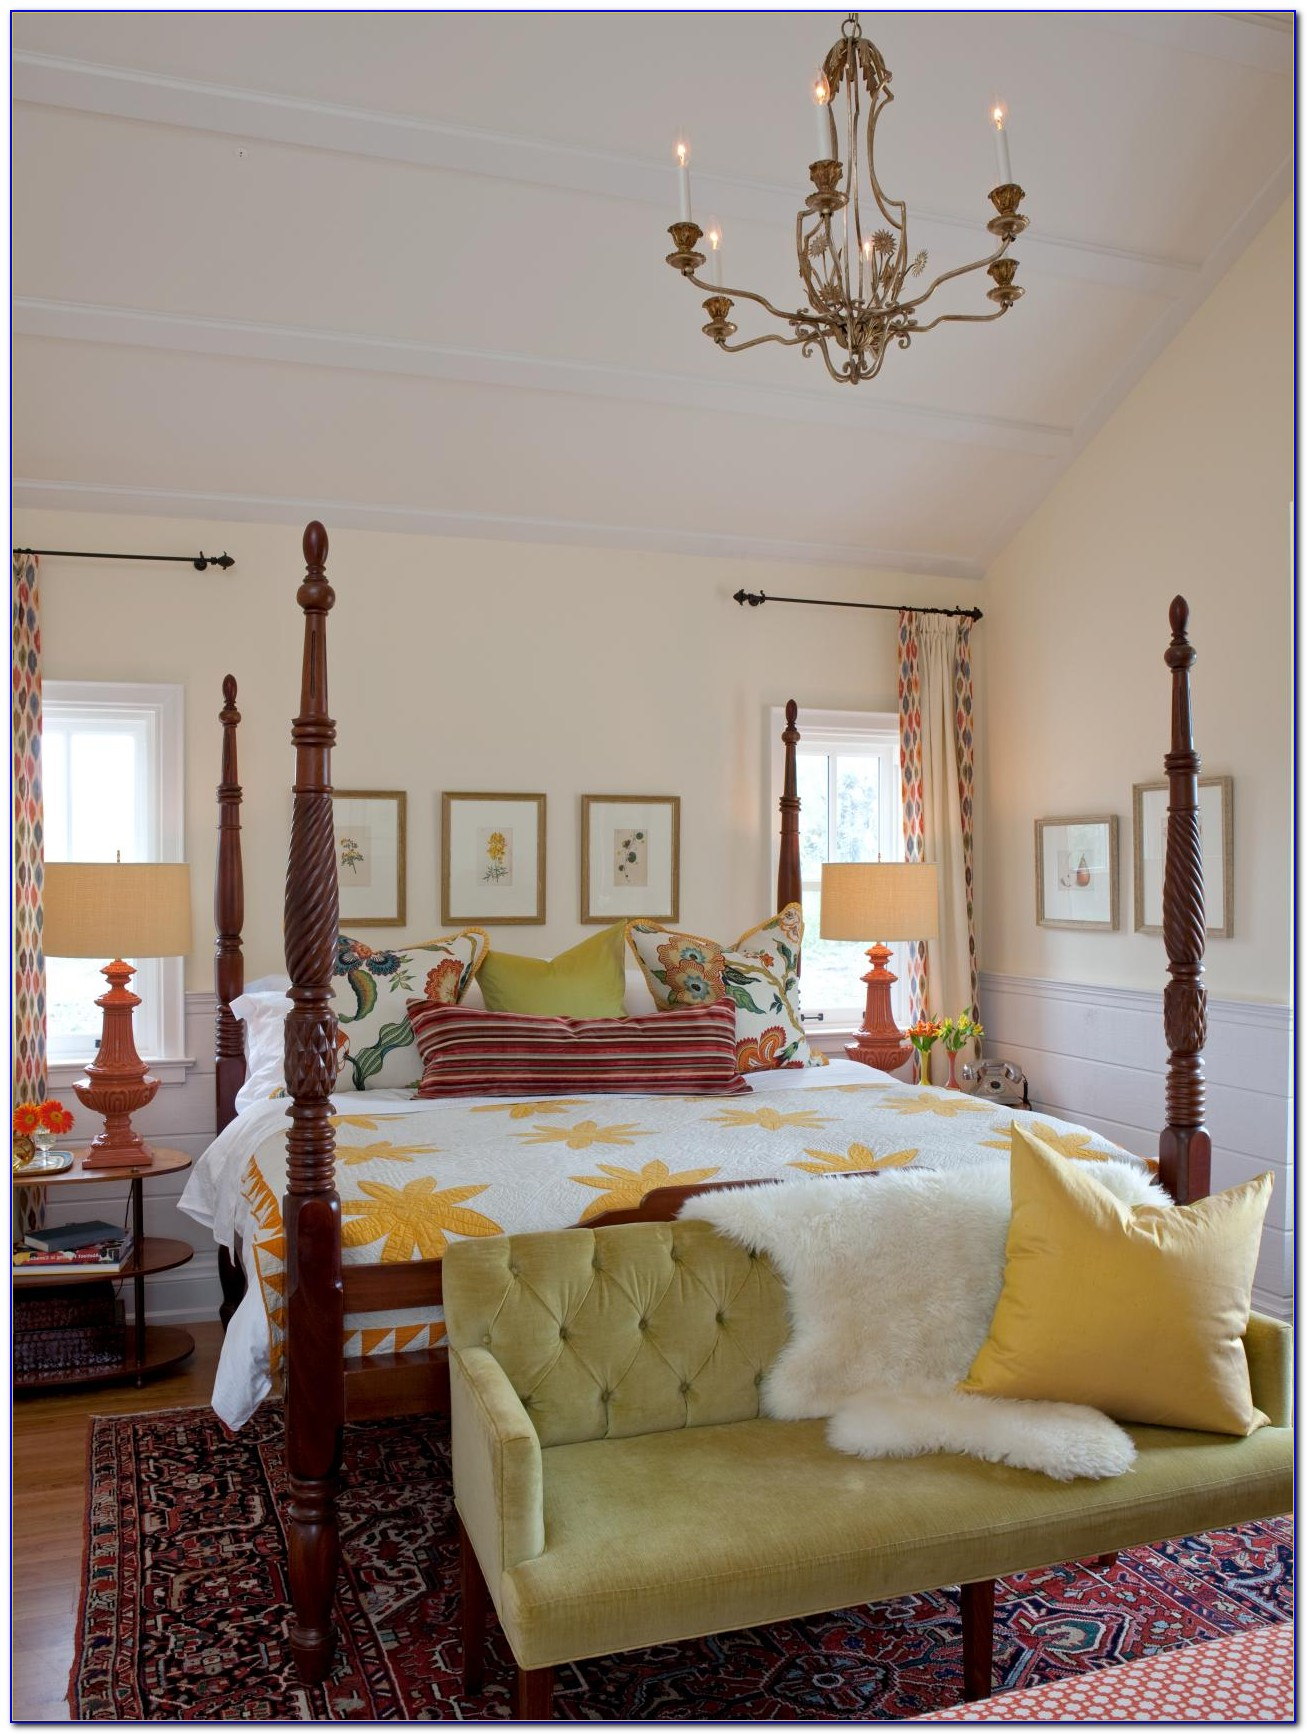 Bedroom Window Treatment Ideas Pictures